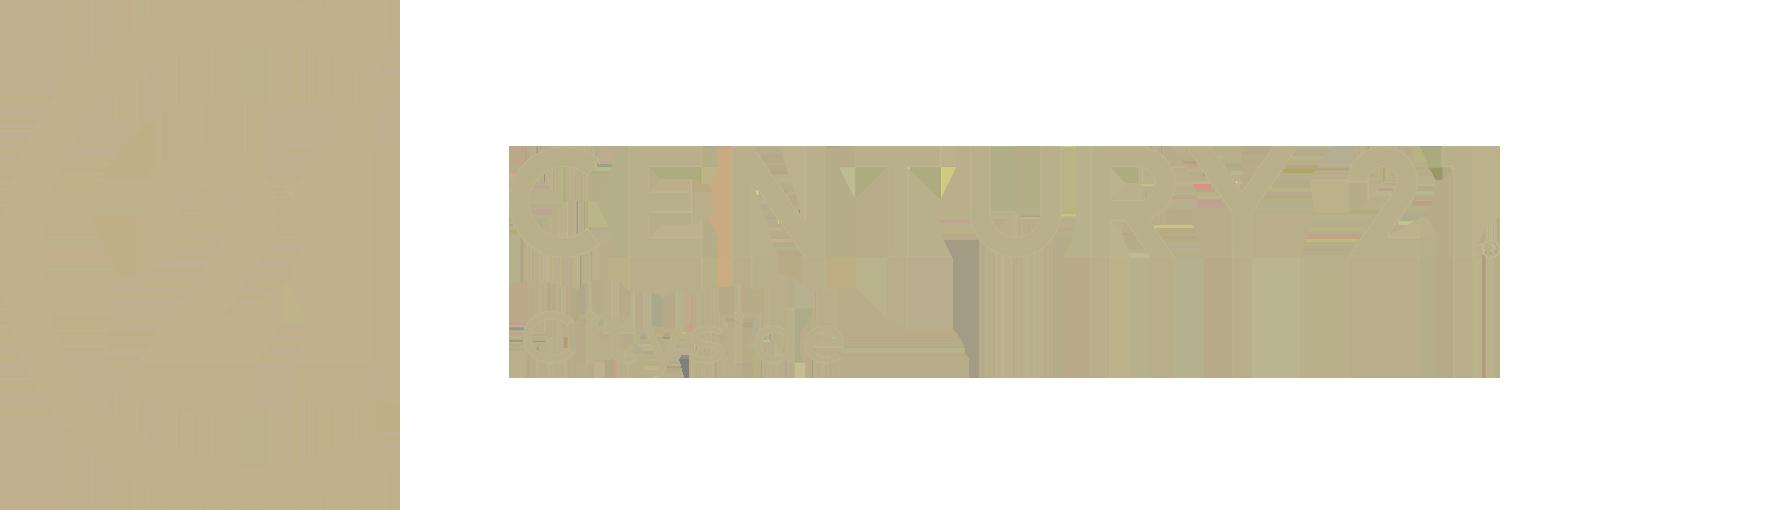 Century 21 Cityside